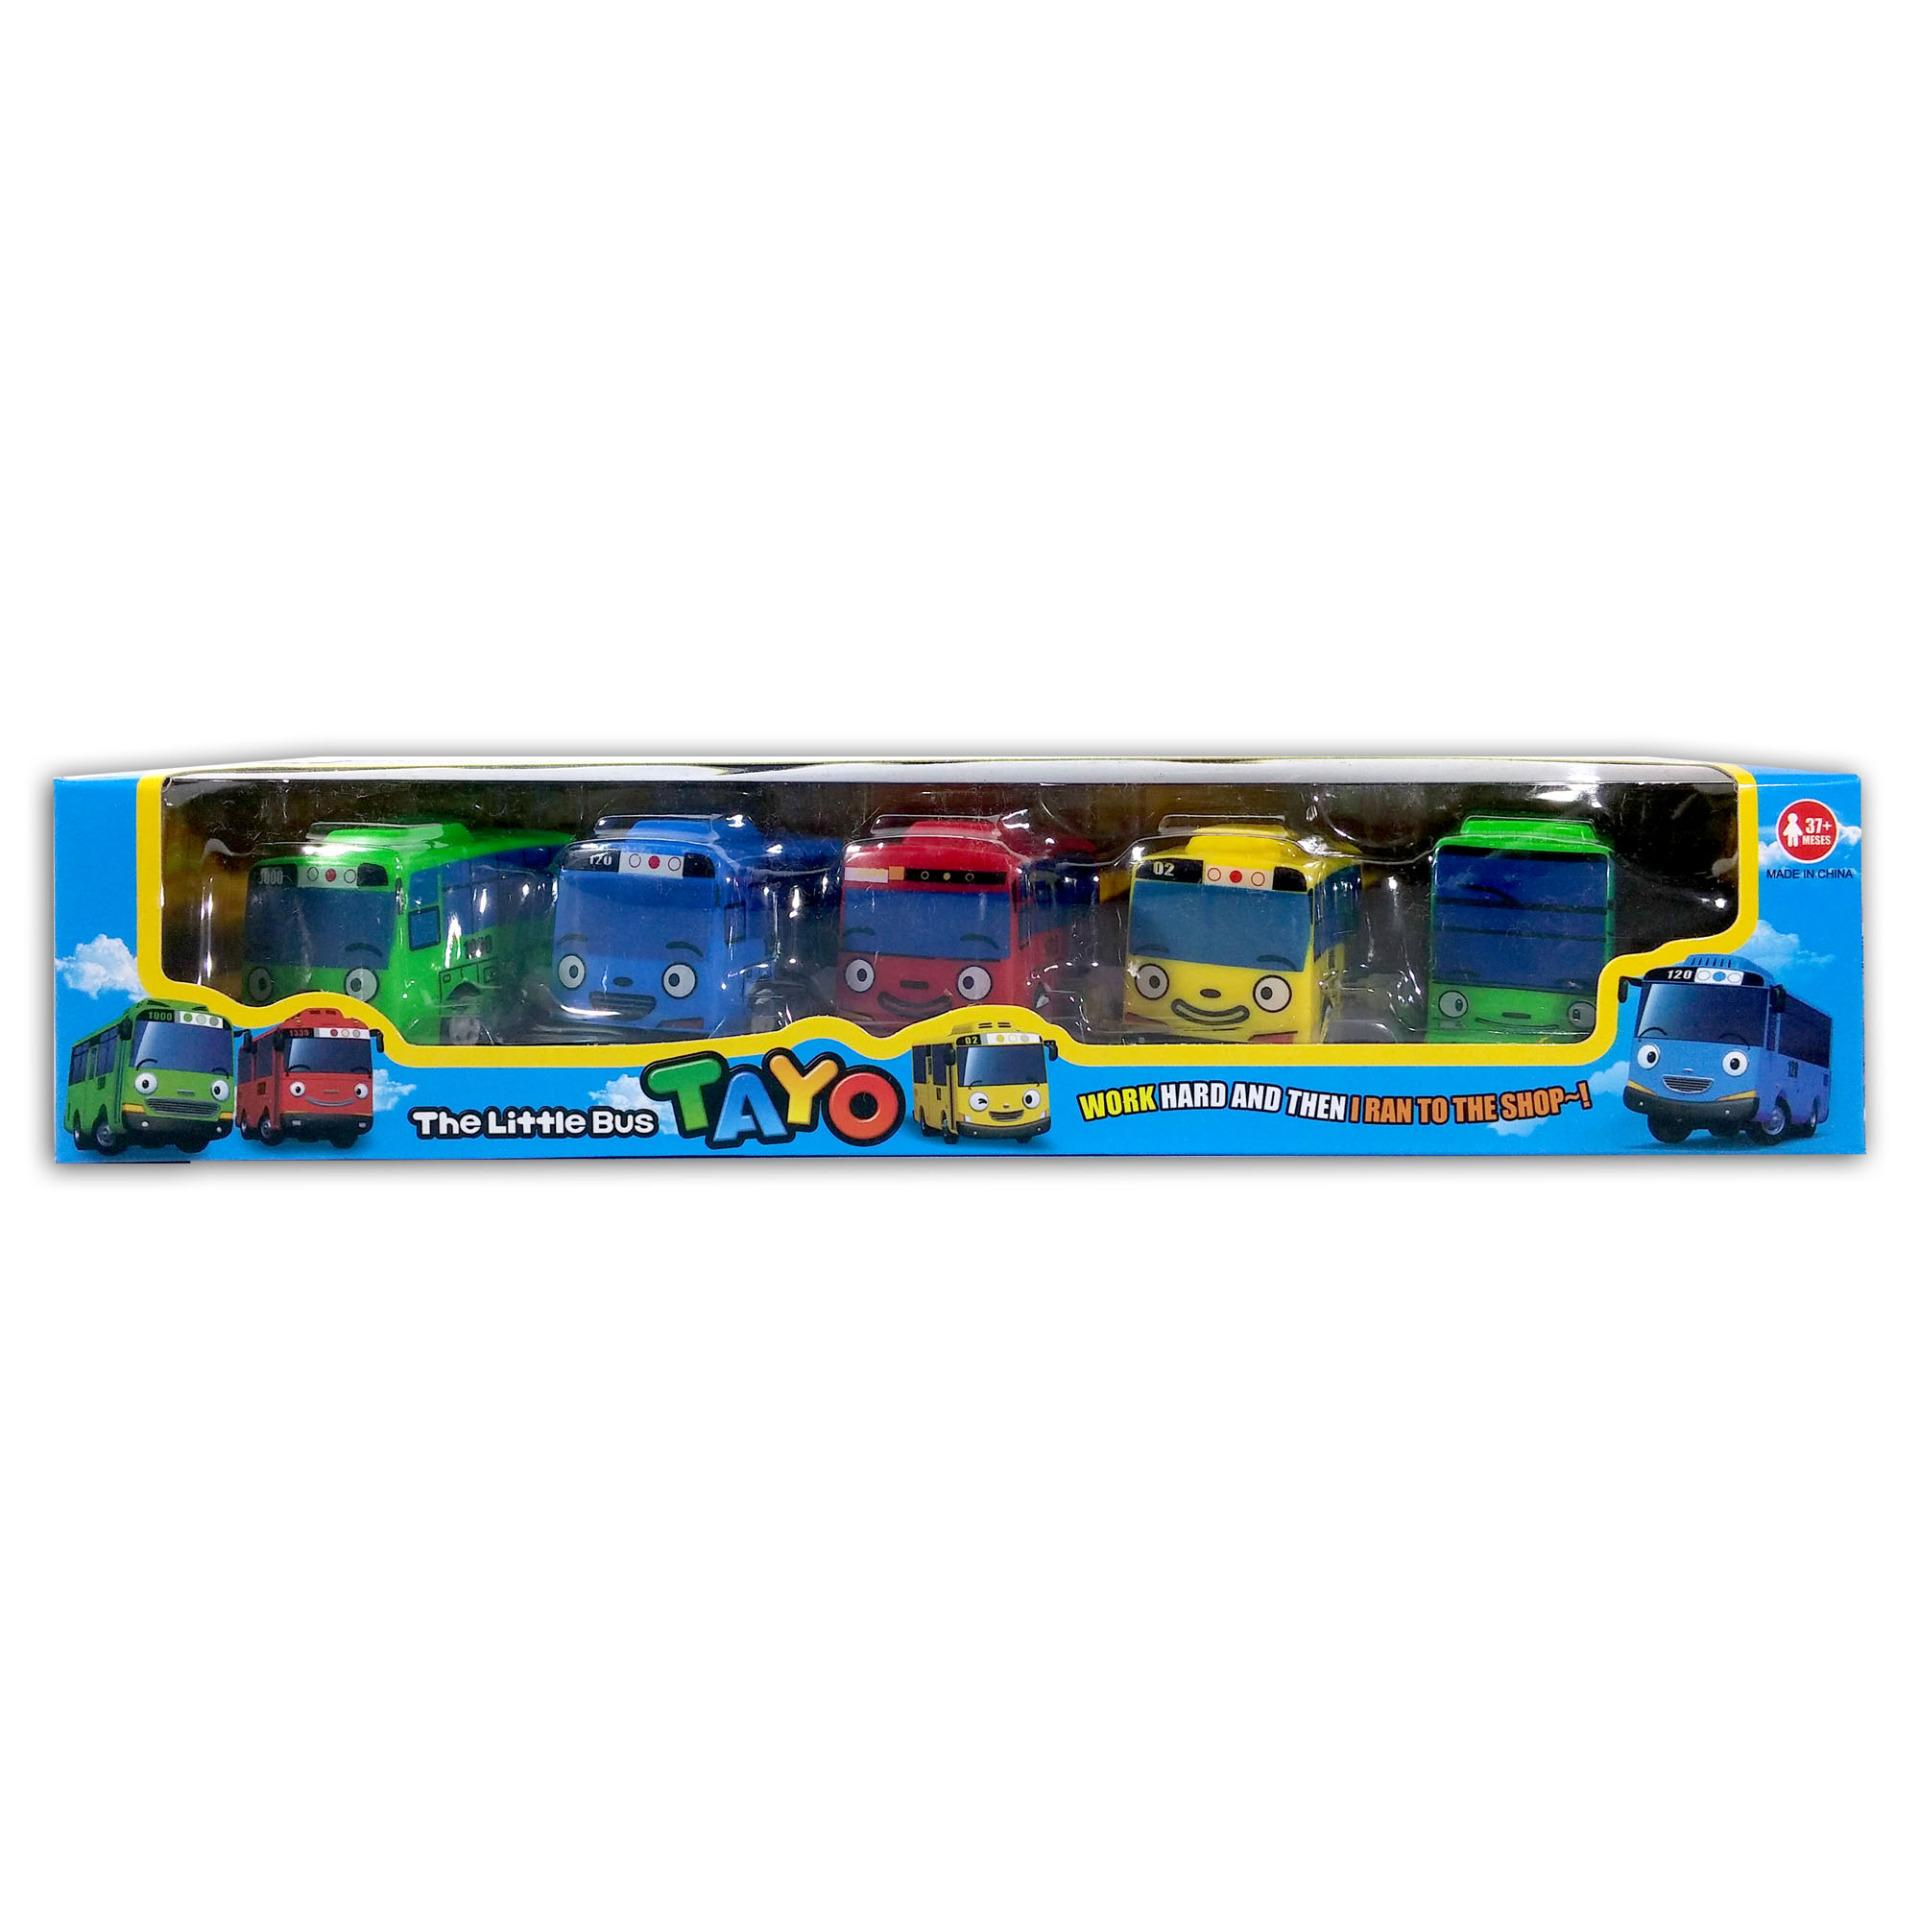 Cek Harga Baru Gani Tayo Bus Kecil Mainan 118 Pcs Tumpukan Blok Katalog Anak Lelaki Fio Online The Little 1 Set 5 Play